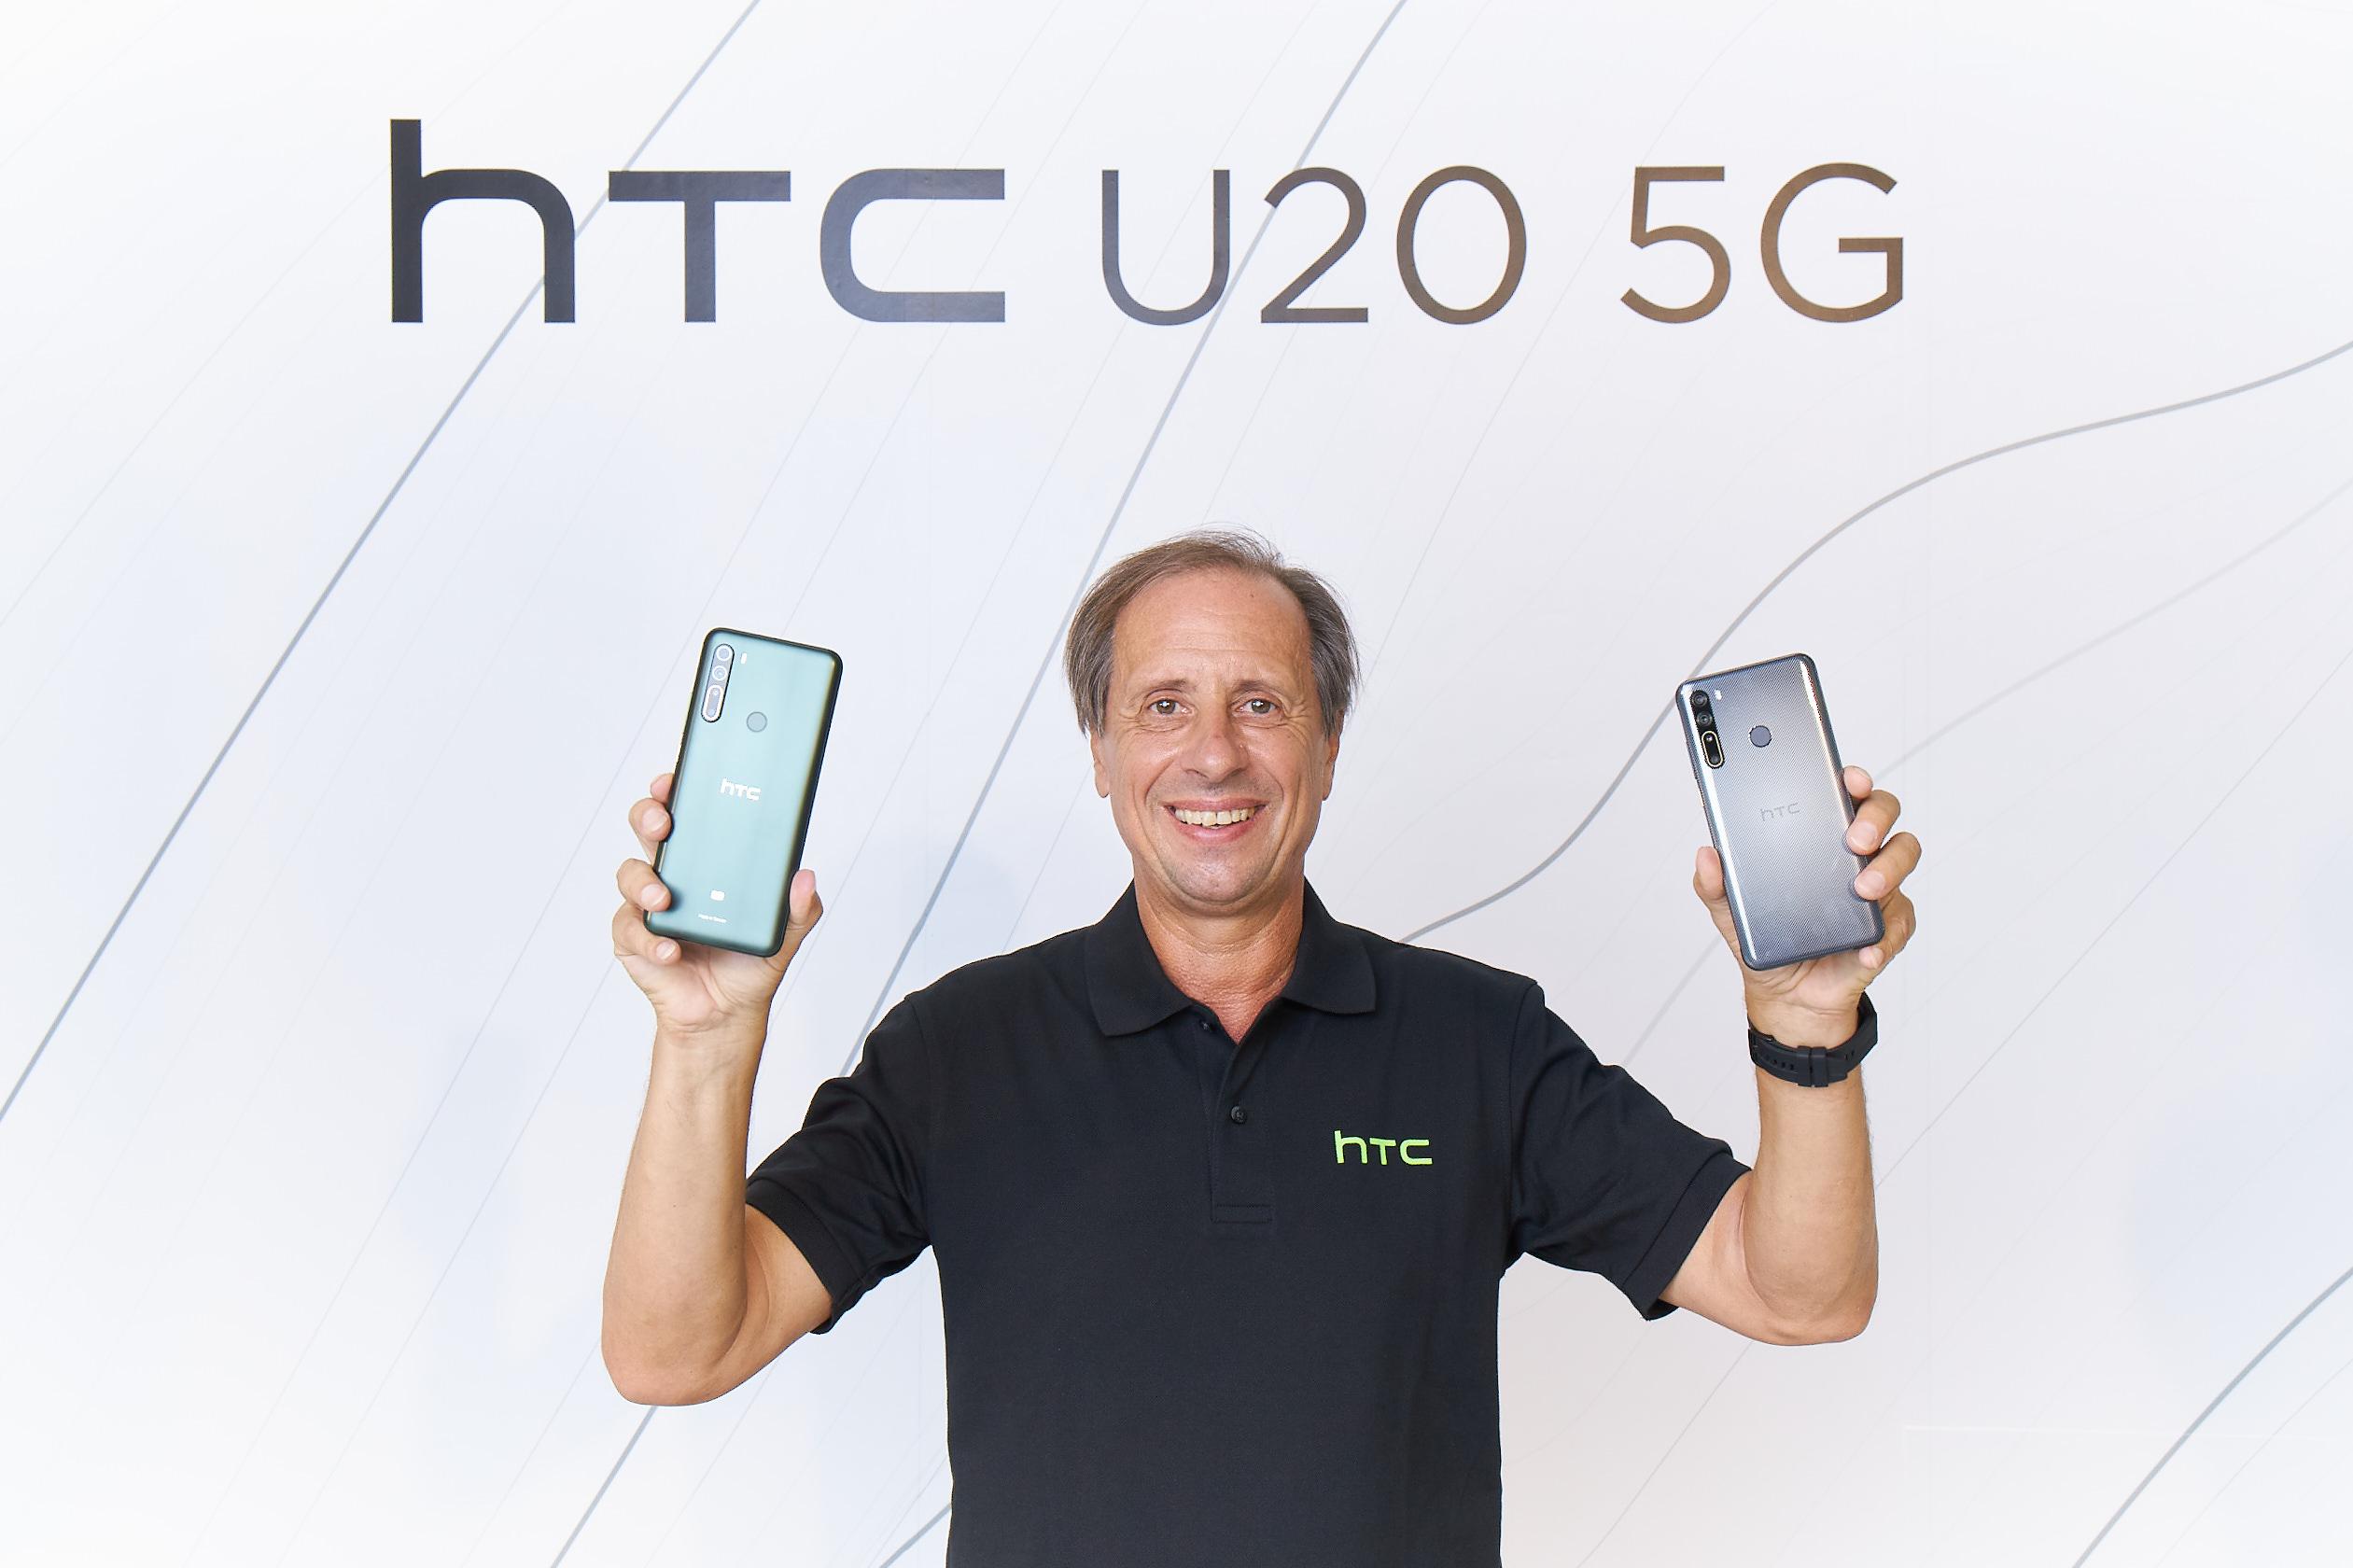 HTC CEO Yves Maitre新聞照片